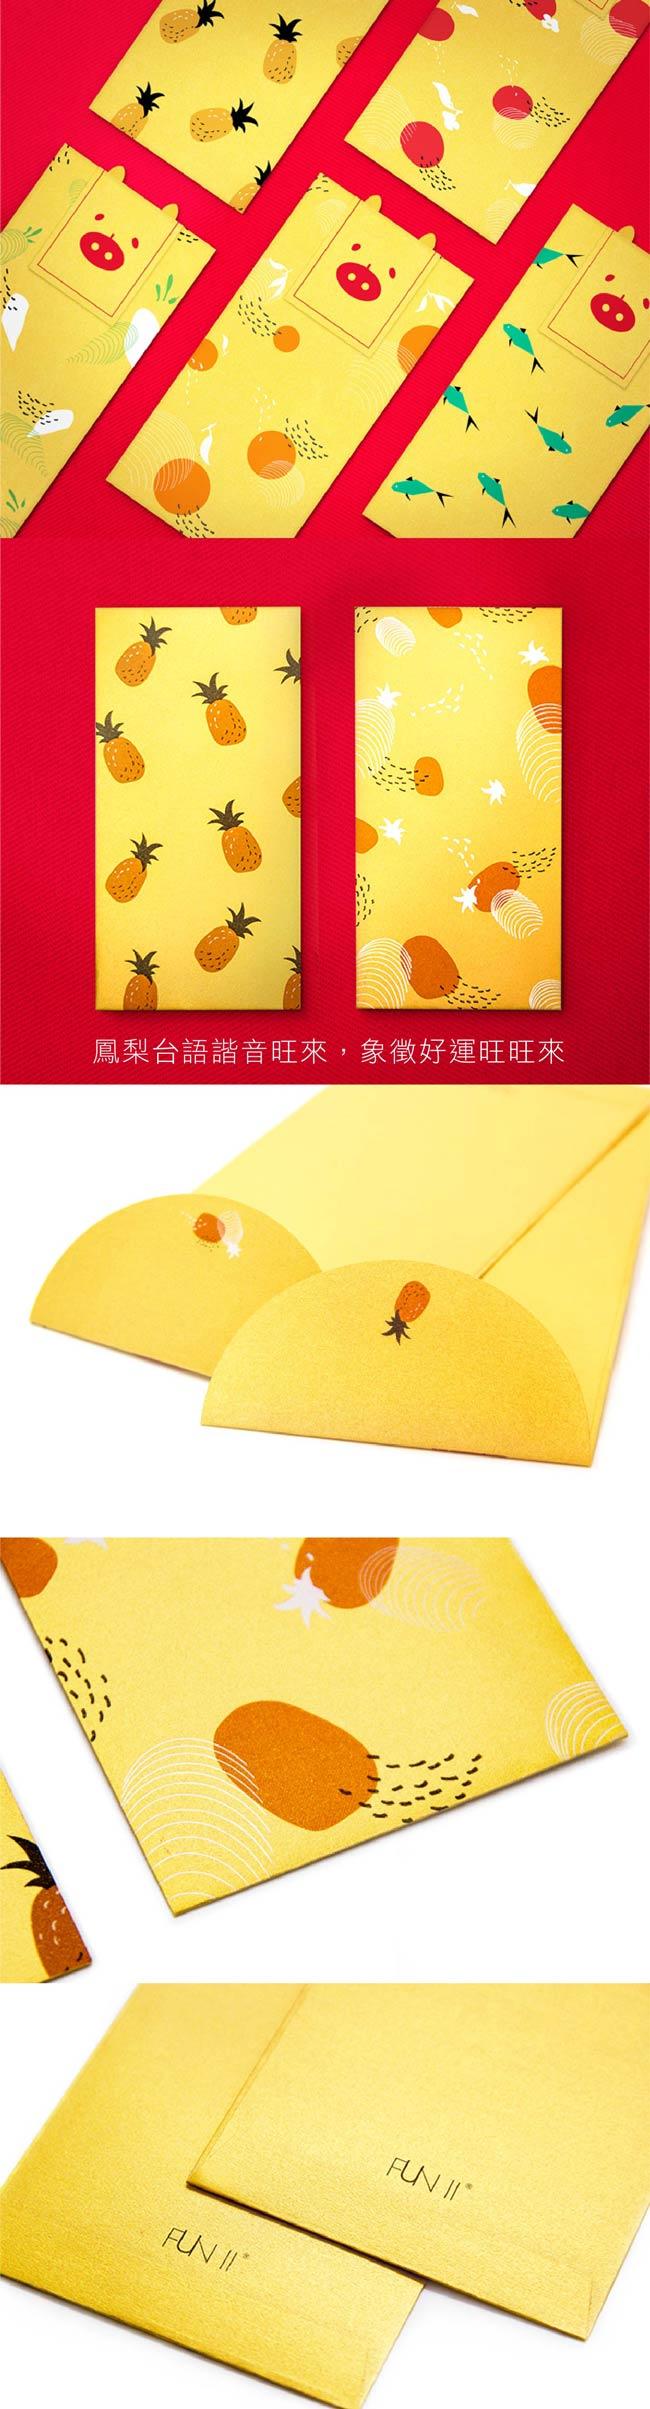 FUN ll|金厚紅包禮袋(鳳梨)